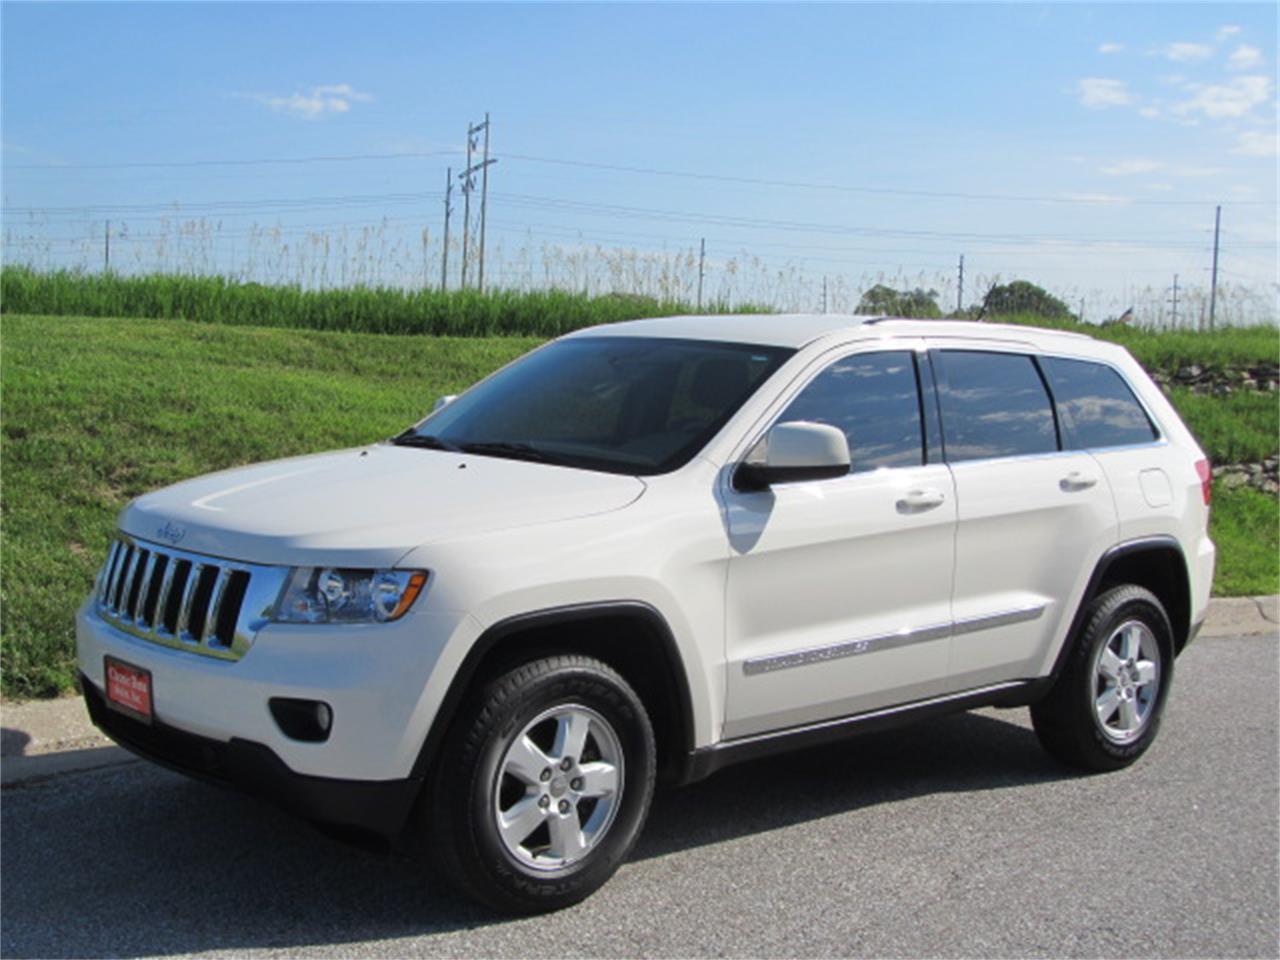 for sale 2011 jeep grand cherokee in omaha, nebraska cars - omaha, ne at geebo